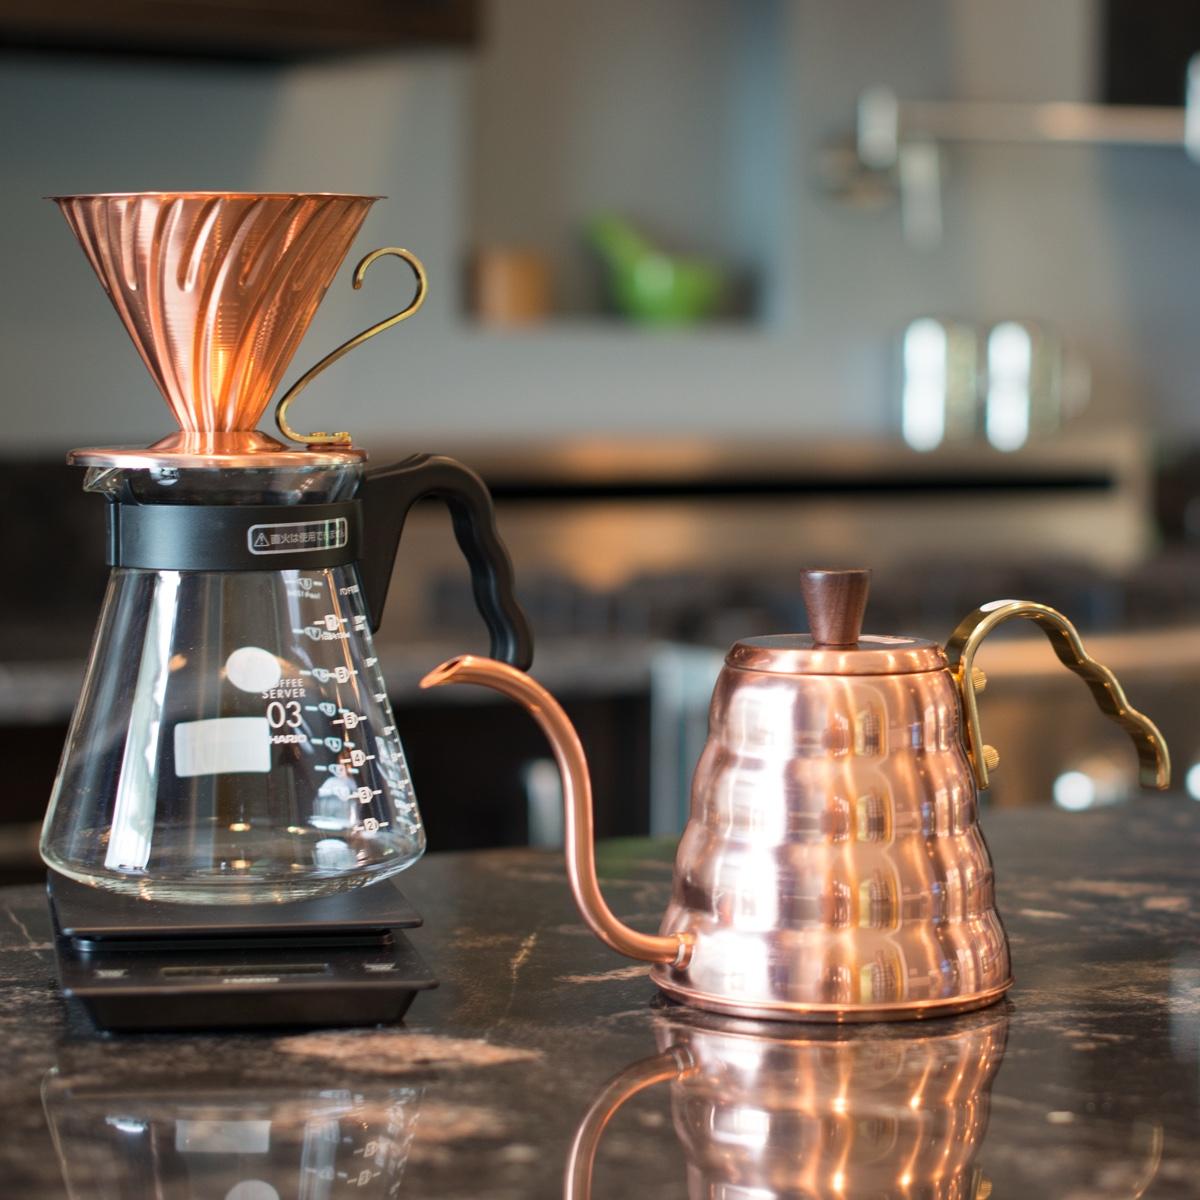 V60 copper kettle and dripper. Image viaPrima Coffee Equipment.